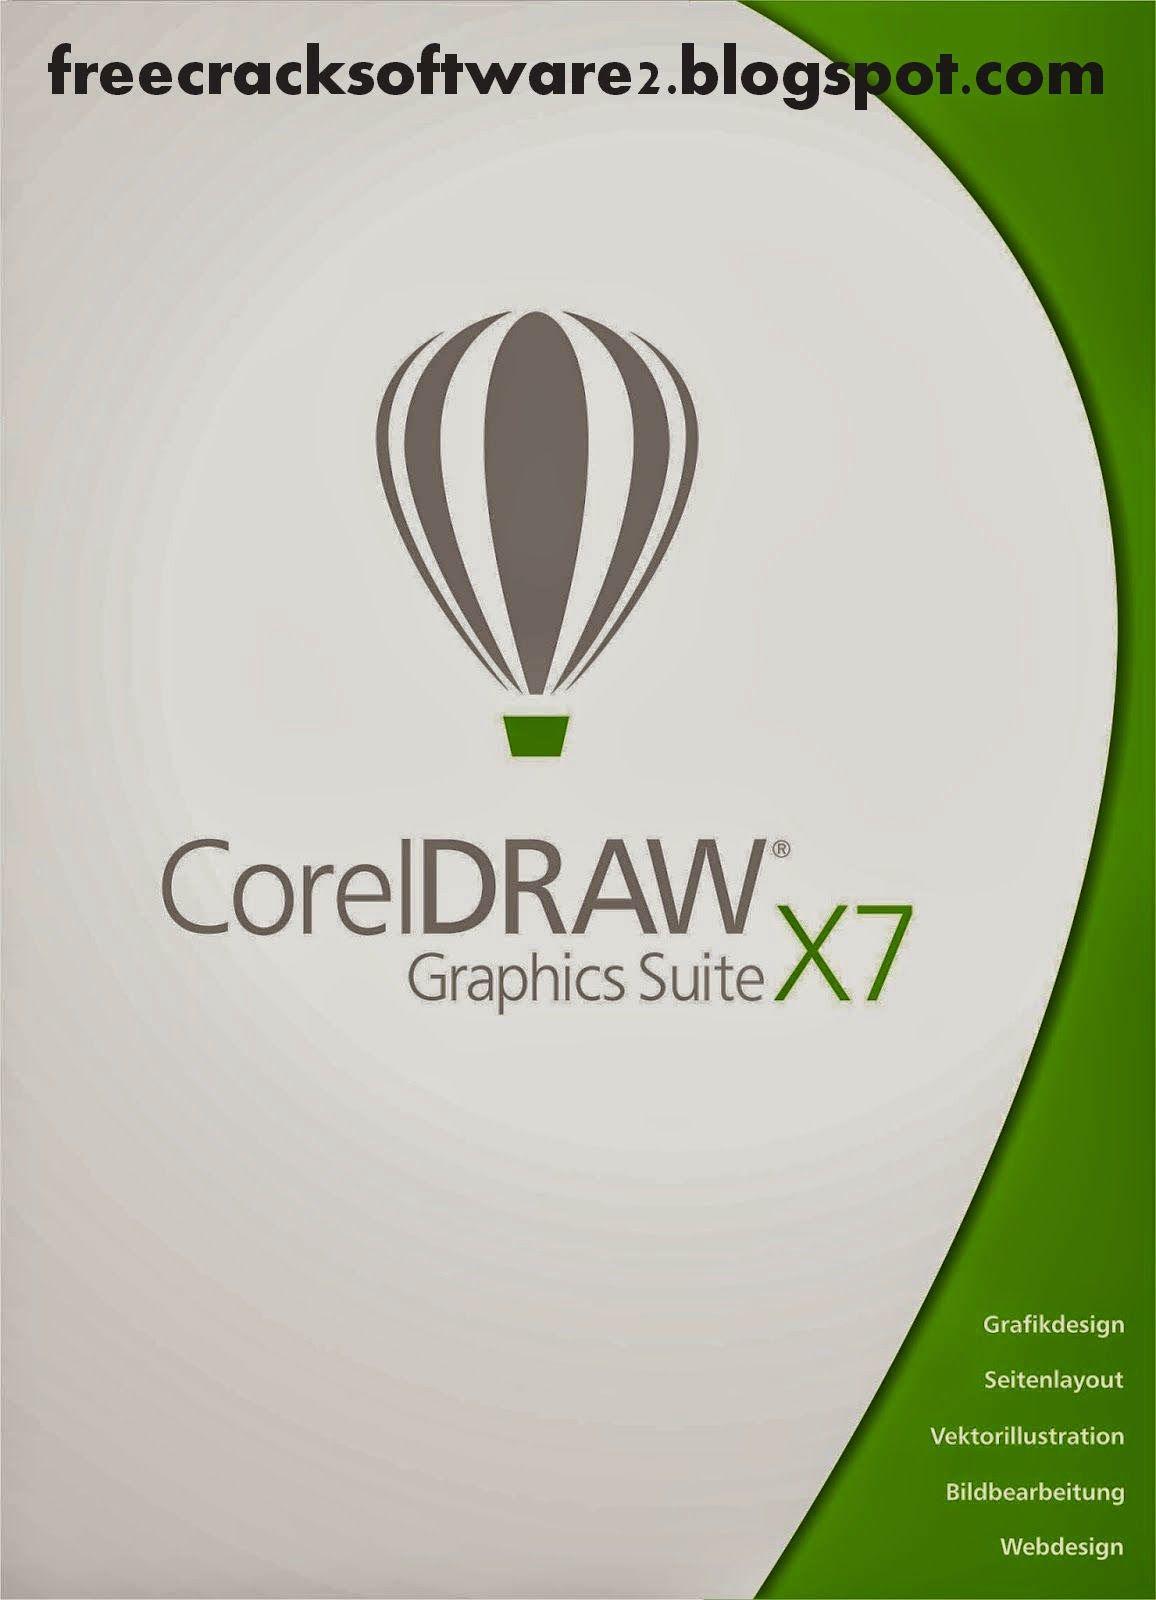 Pin By Erick Mutale On Coreldraw Coreldraw Professional Graphic Design Graphic